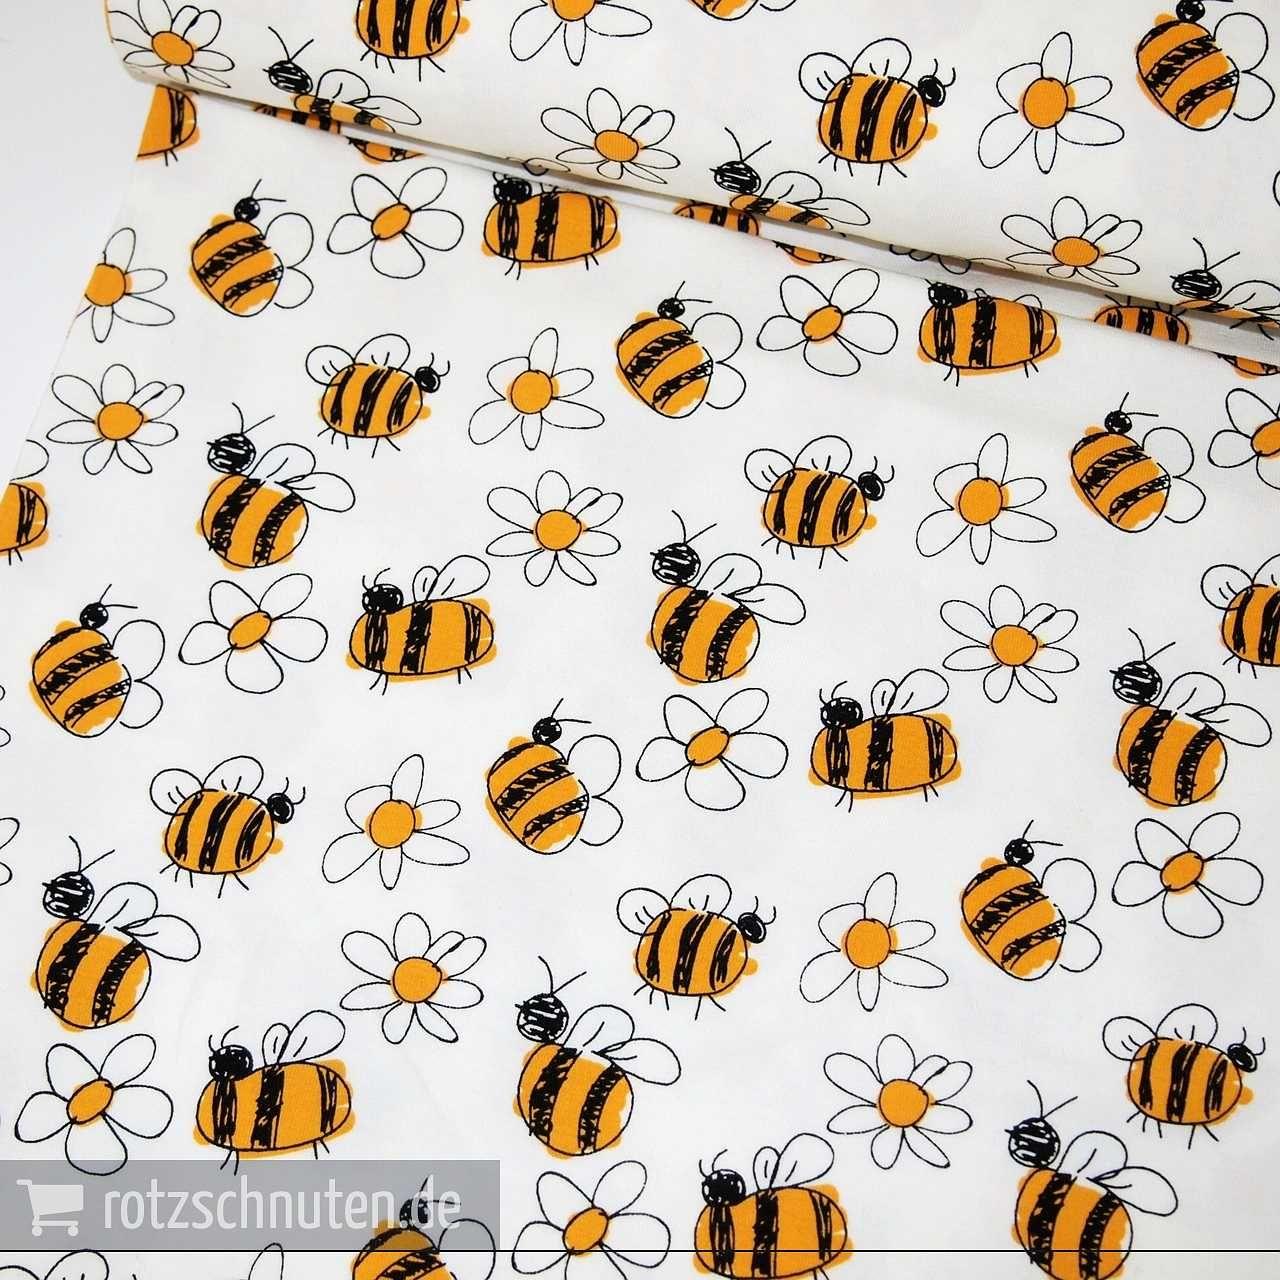 Baumwolljersey BEE – Bienen & Blumen | Pinterest | Bienen, Hände ...